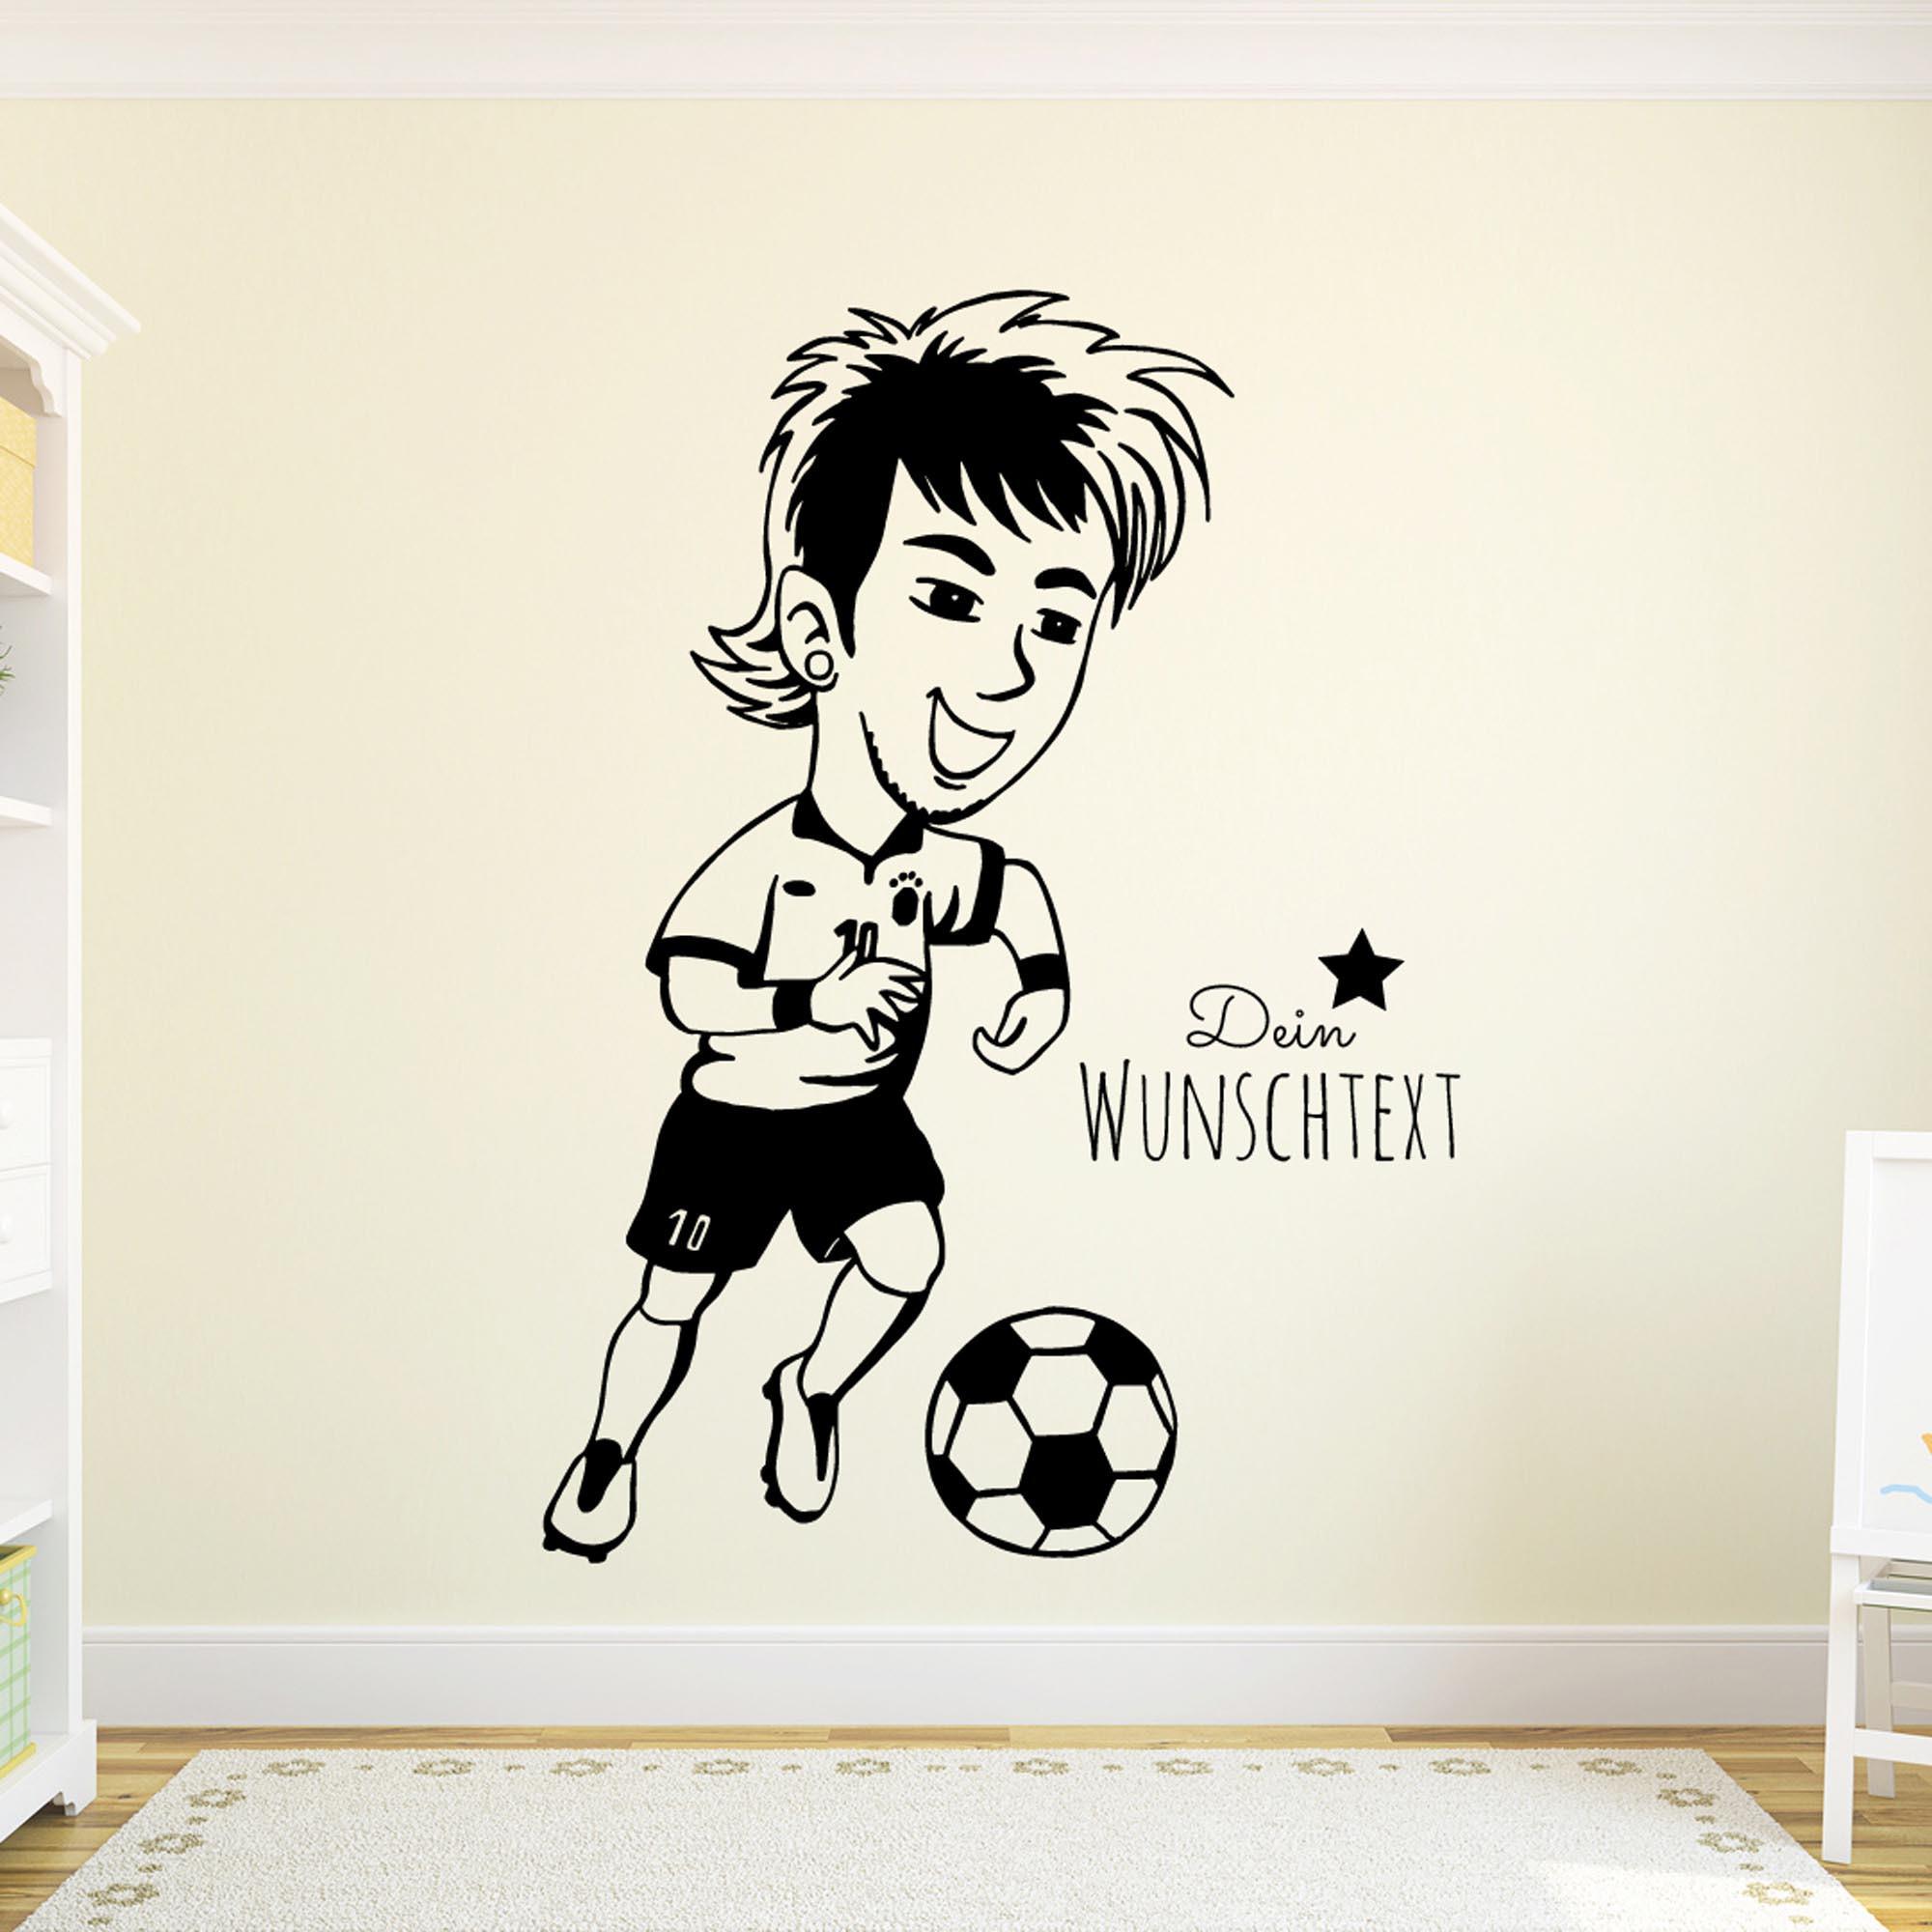 Wundervoll Wandtattoo Fußball Beste Wahl Fussball Fussballspieler Neymar Mit Wunschtext M1965. Fussballspieler